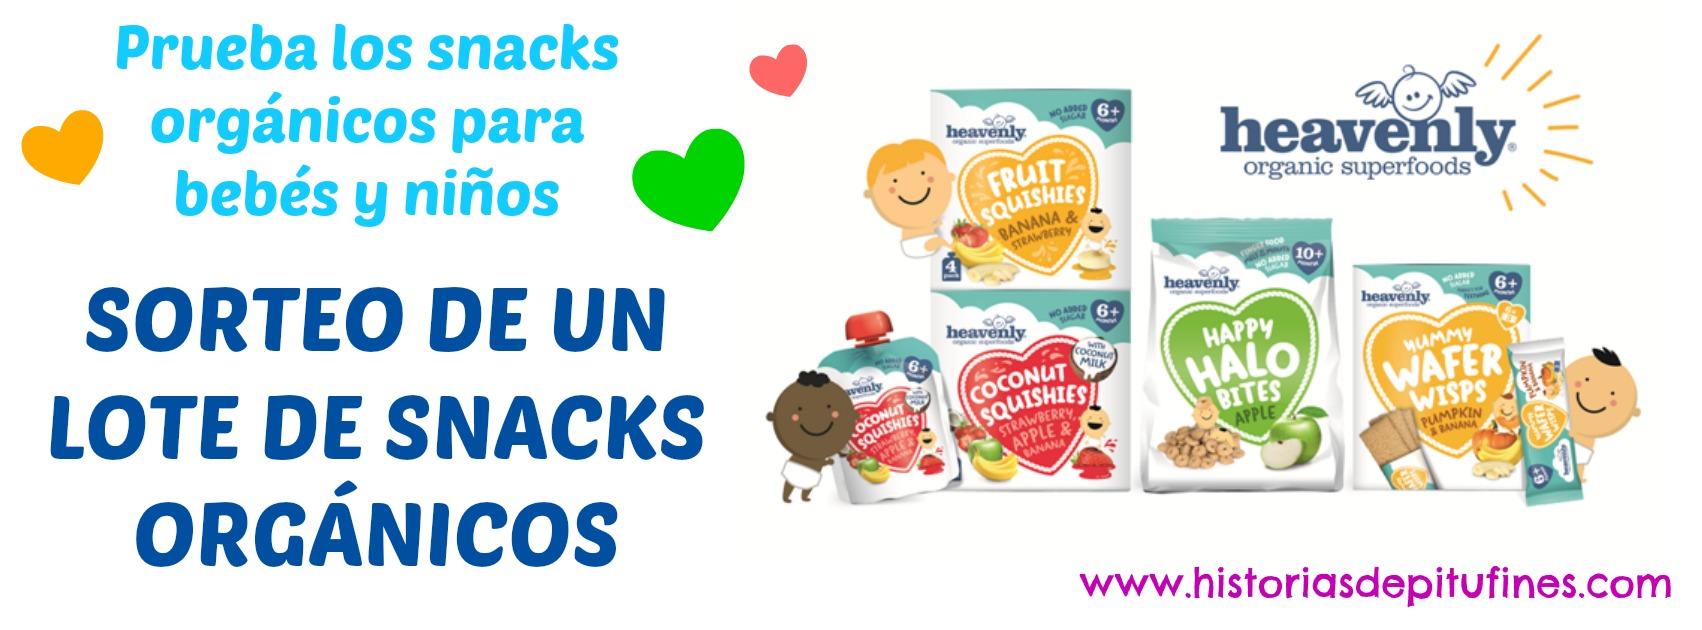 snacks sorteo